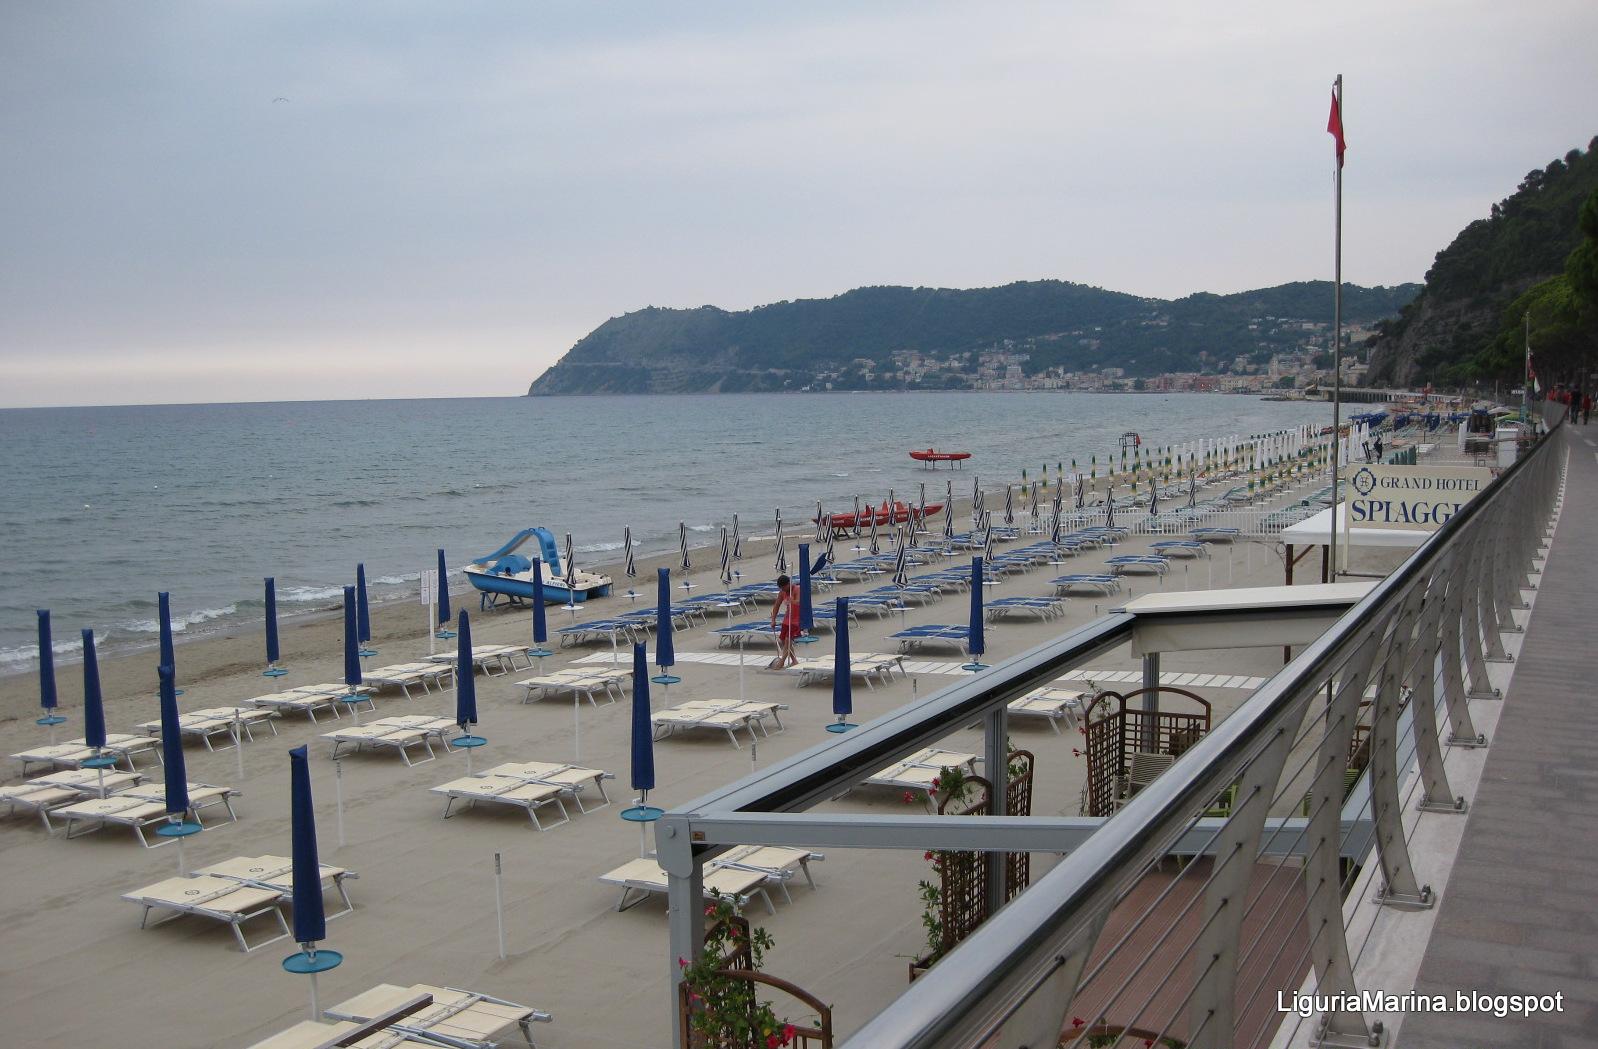 Matrimonio Spiaggia Alassio : Liguriamarina alassio